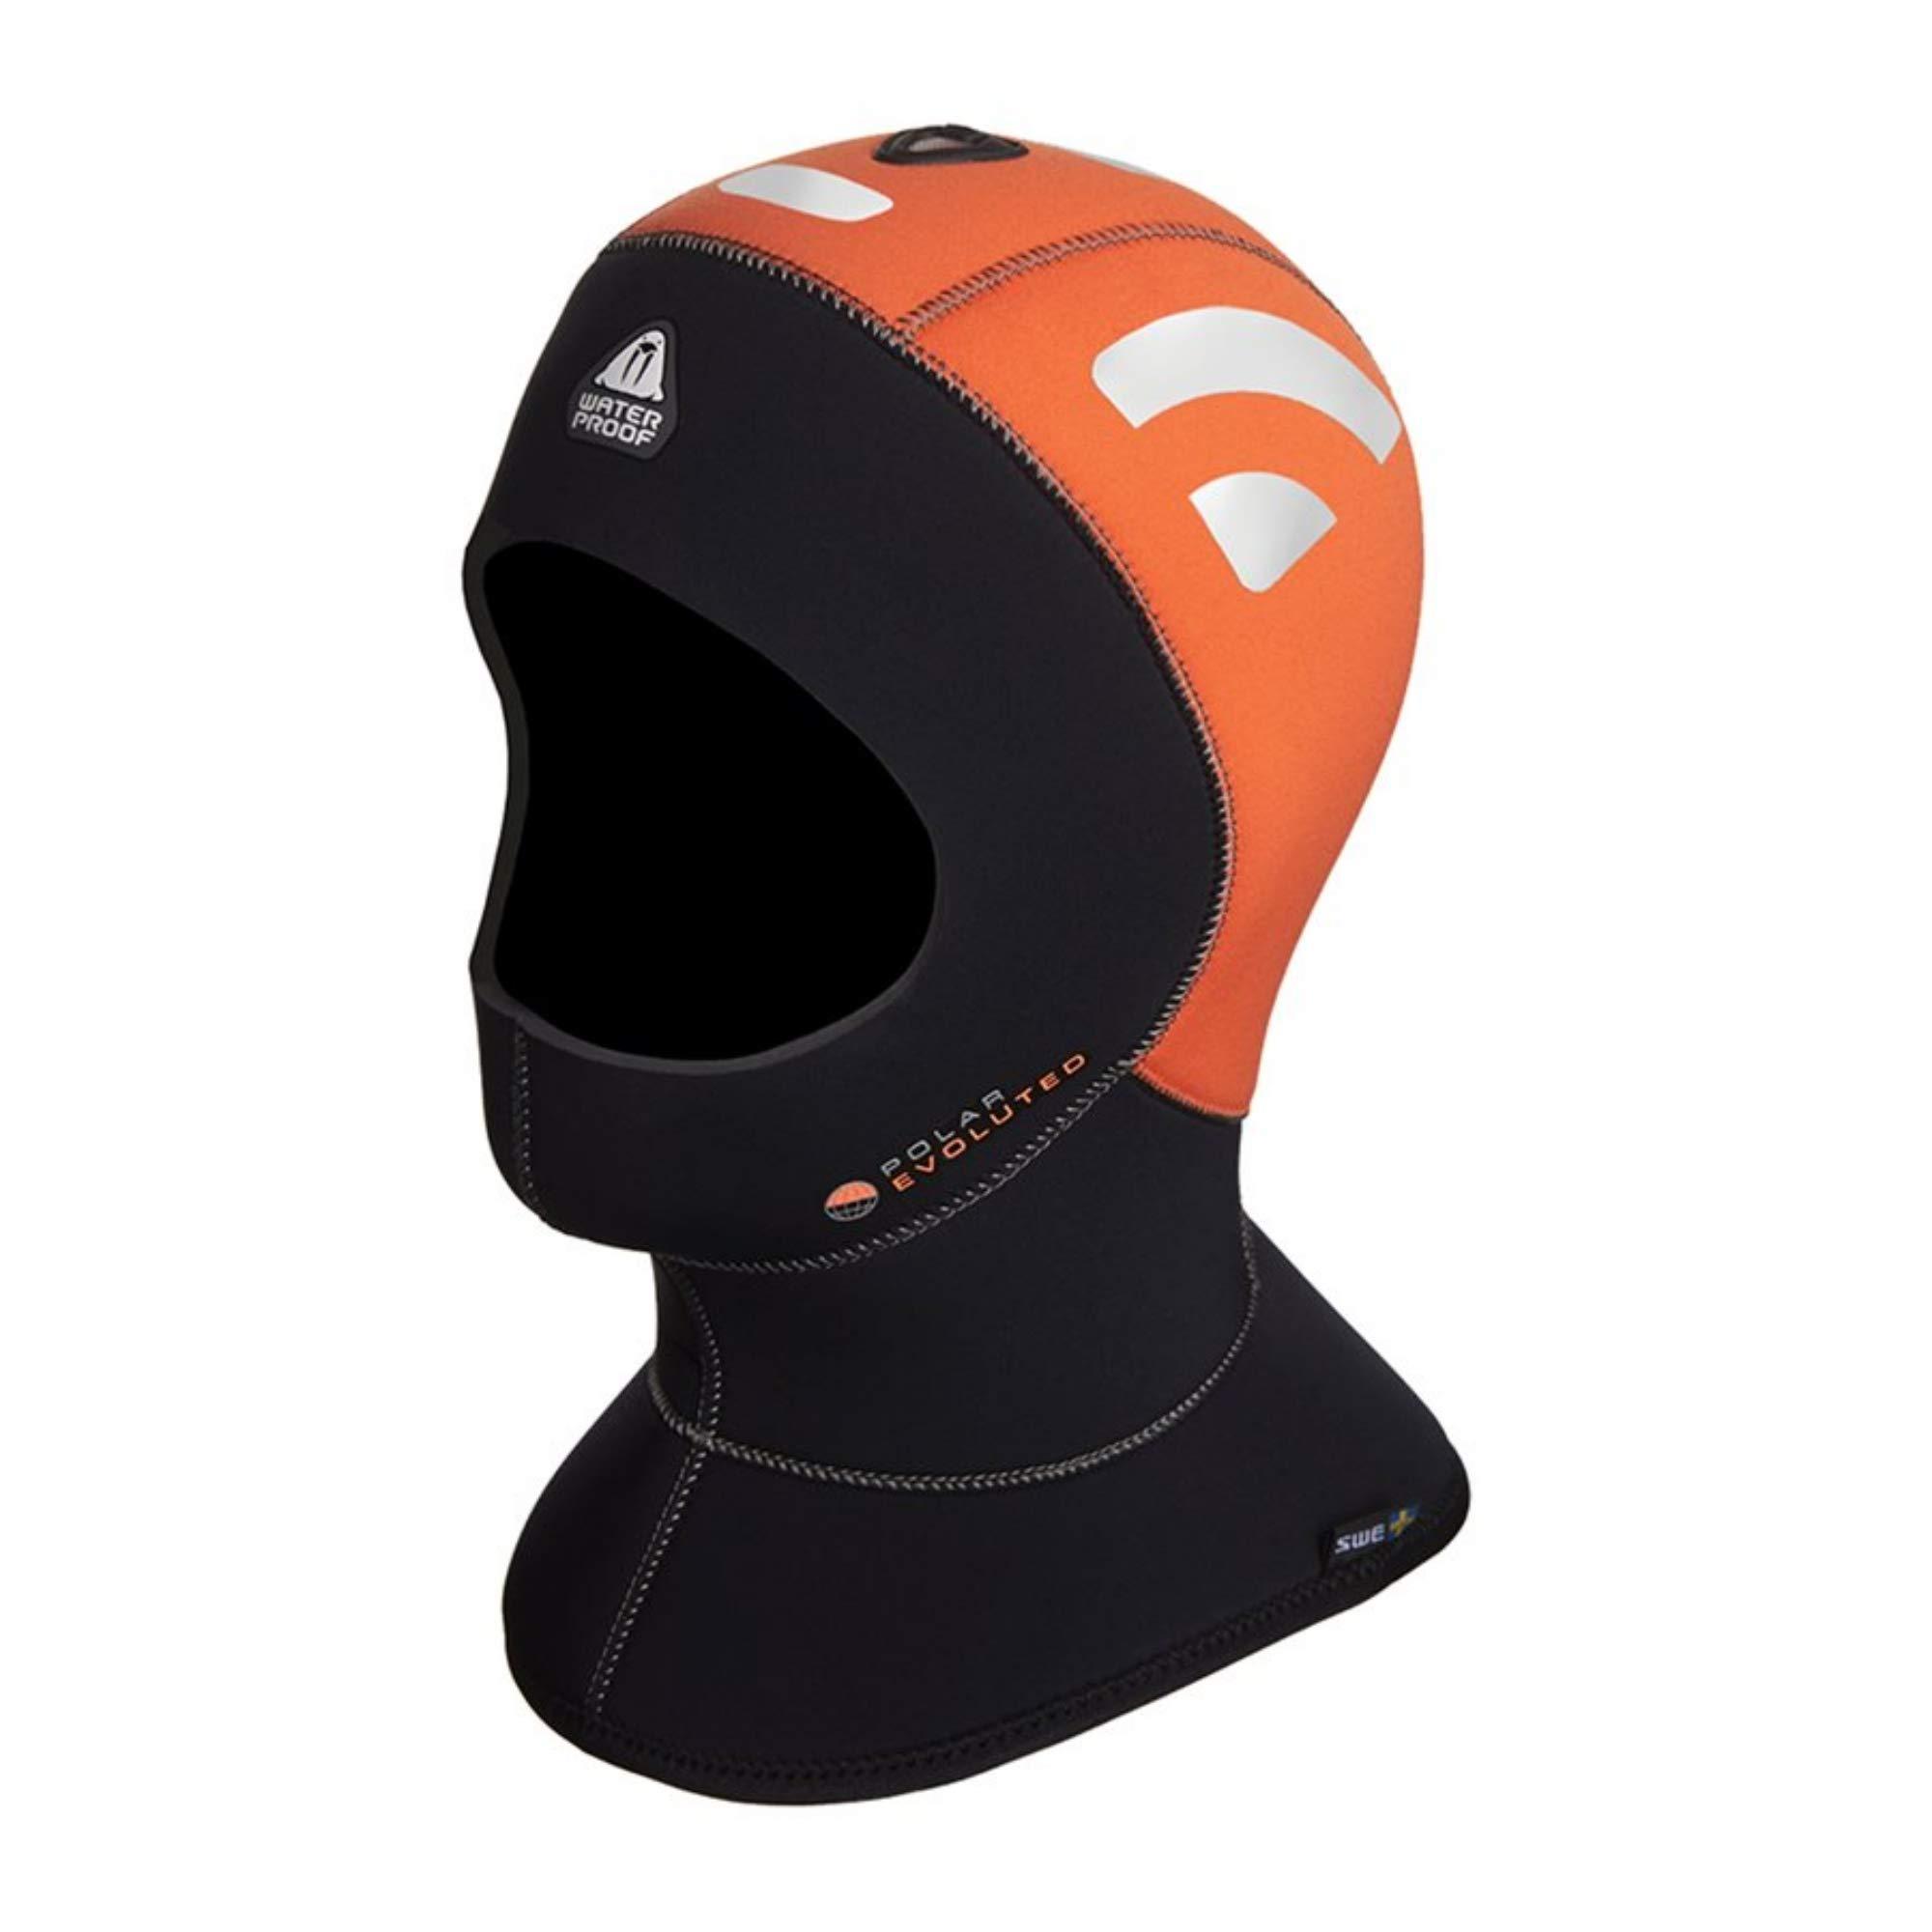 Waterproof H1 5/10mm High Visibility Polar Evo Hood, Medium/Large by Waterproof